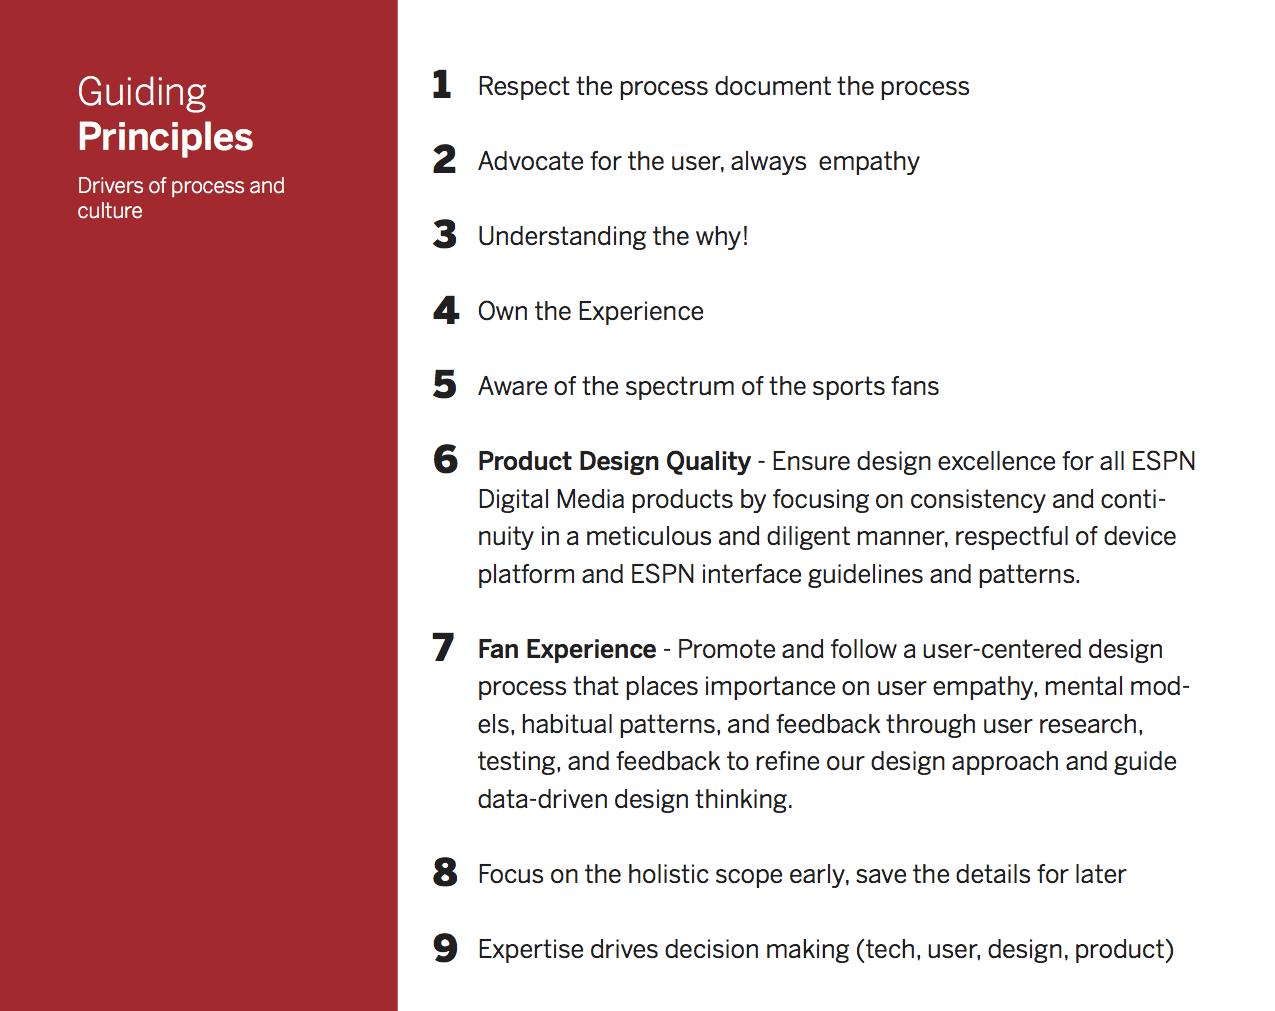 espn-ux_guiding principles-001.png